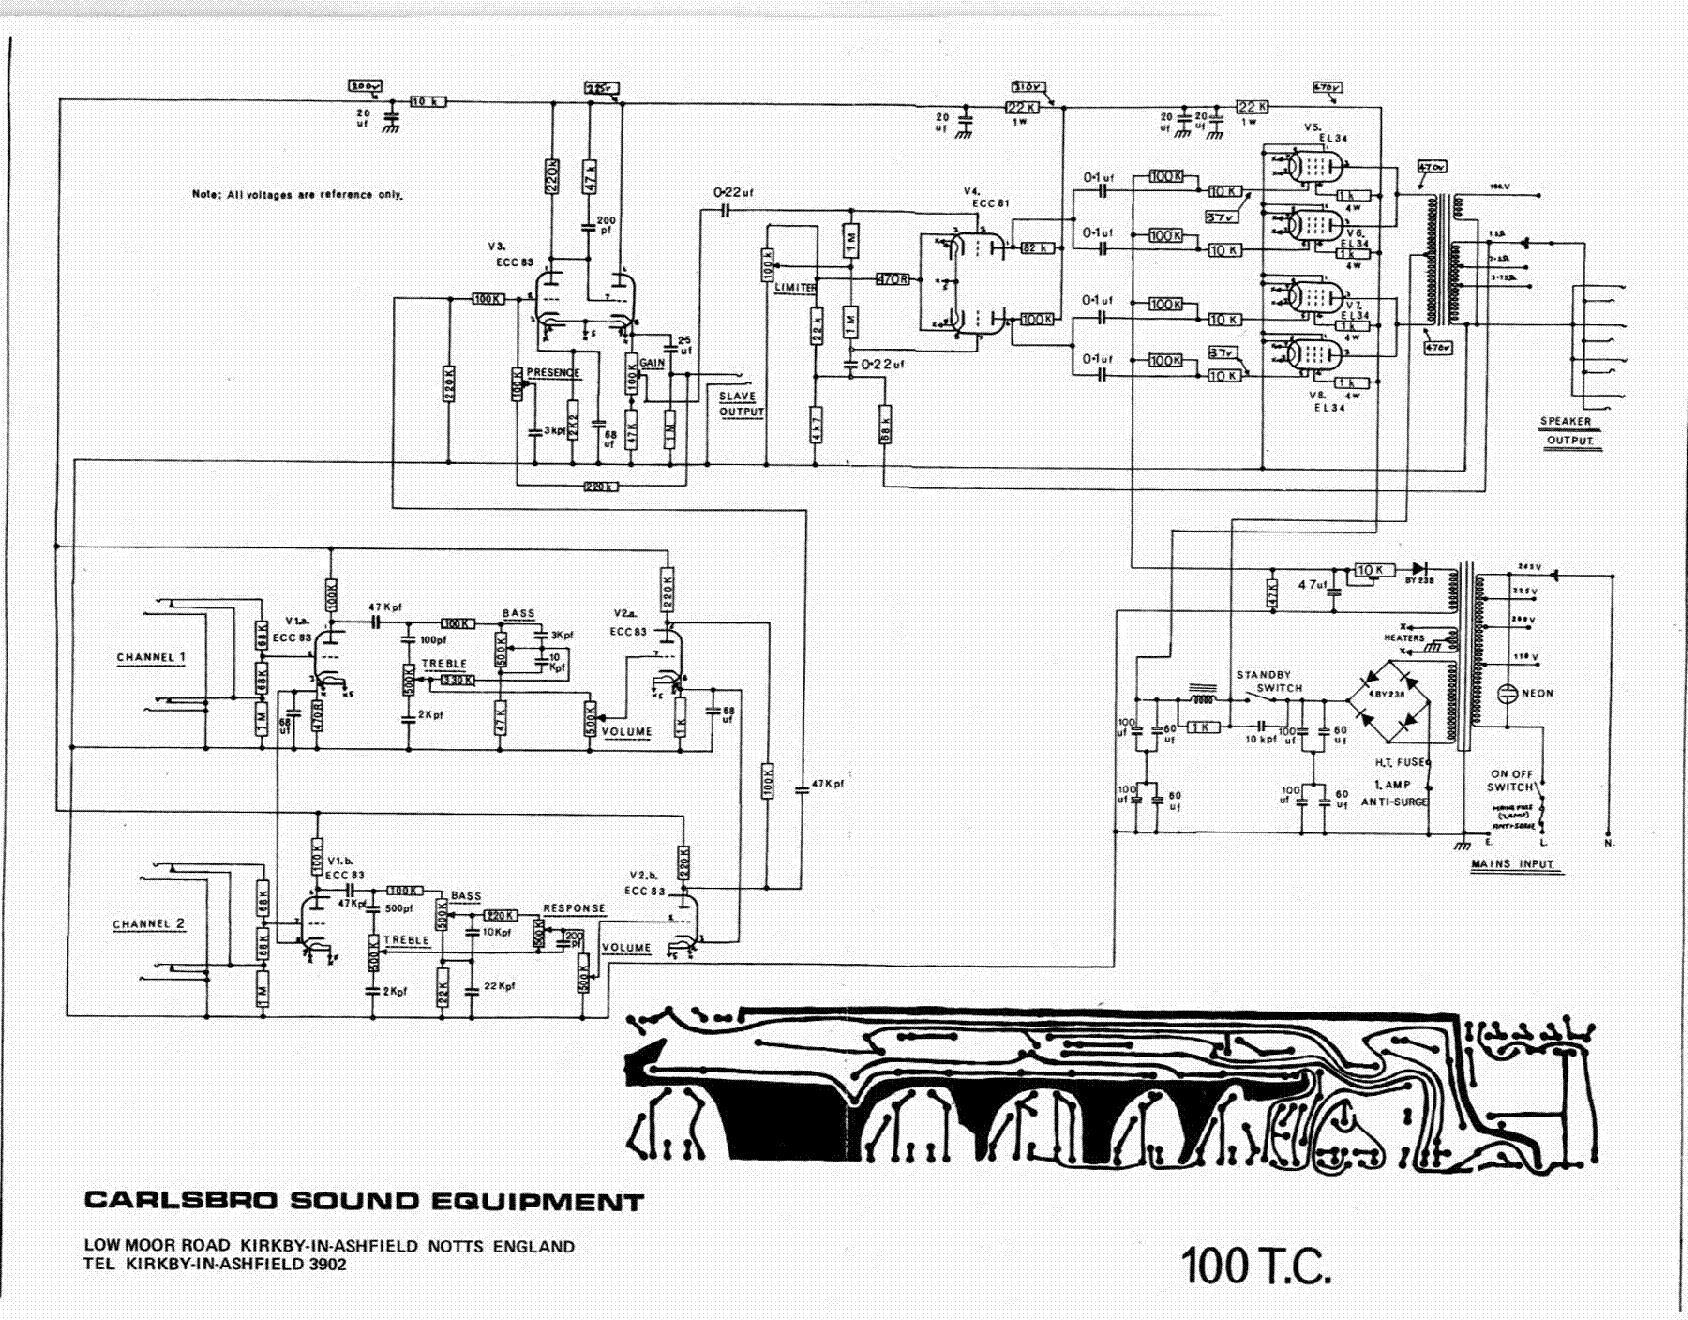 CARLSBRO 100TC SCH service manual (1st page)